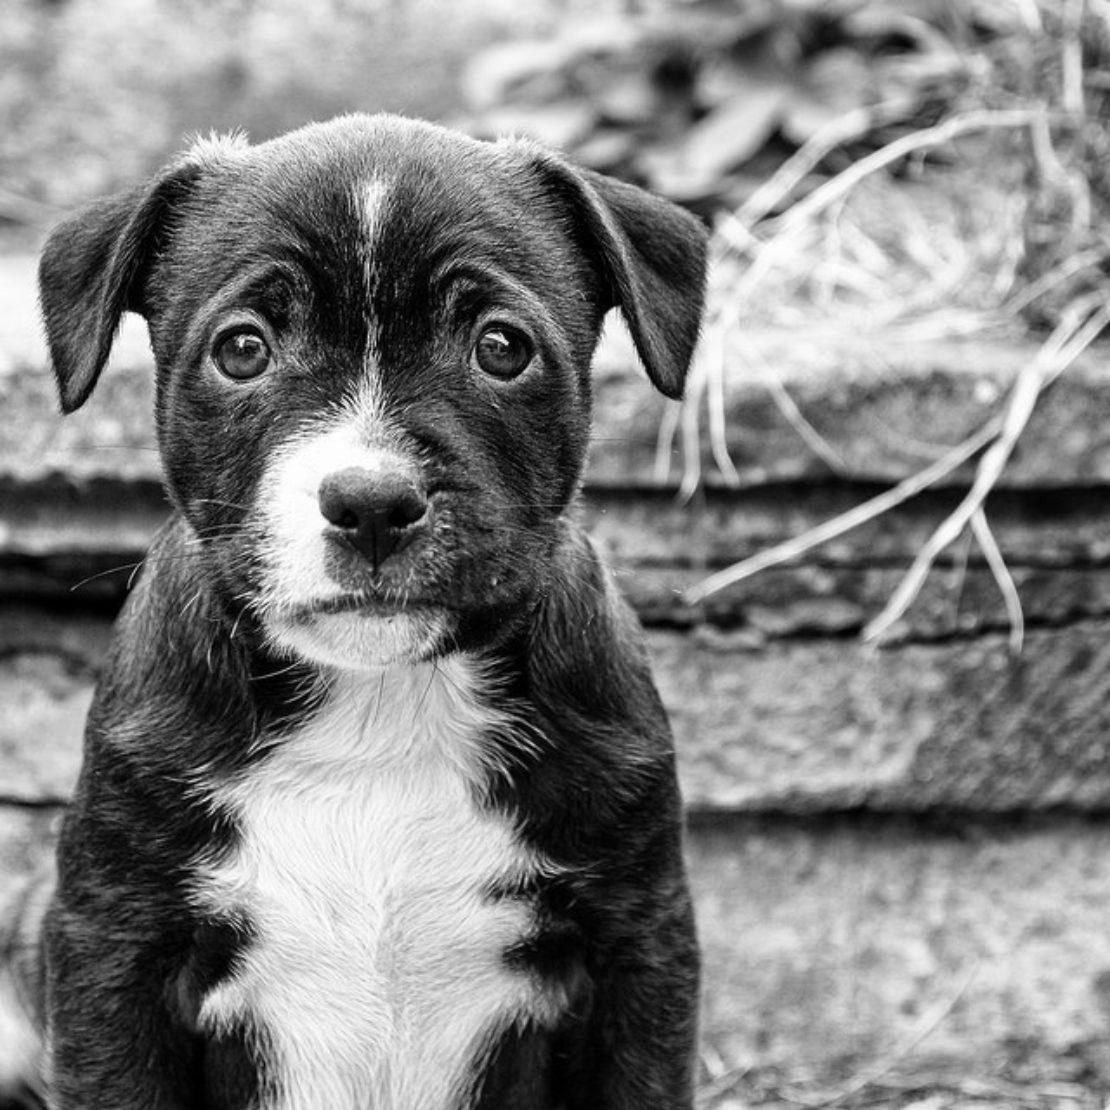 Sad-looking dog, by Stewart Black